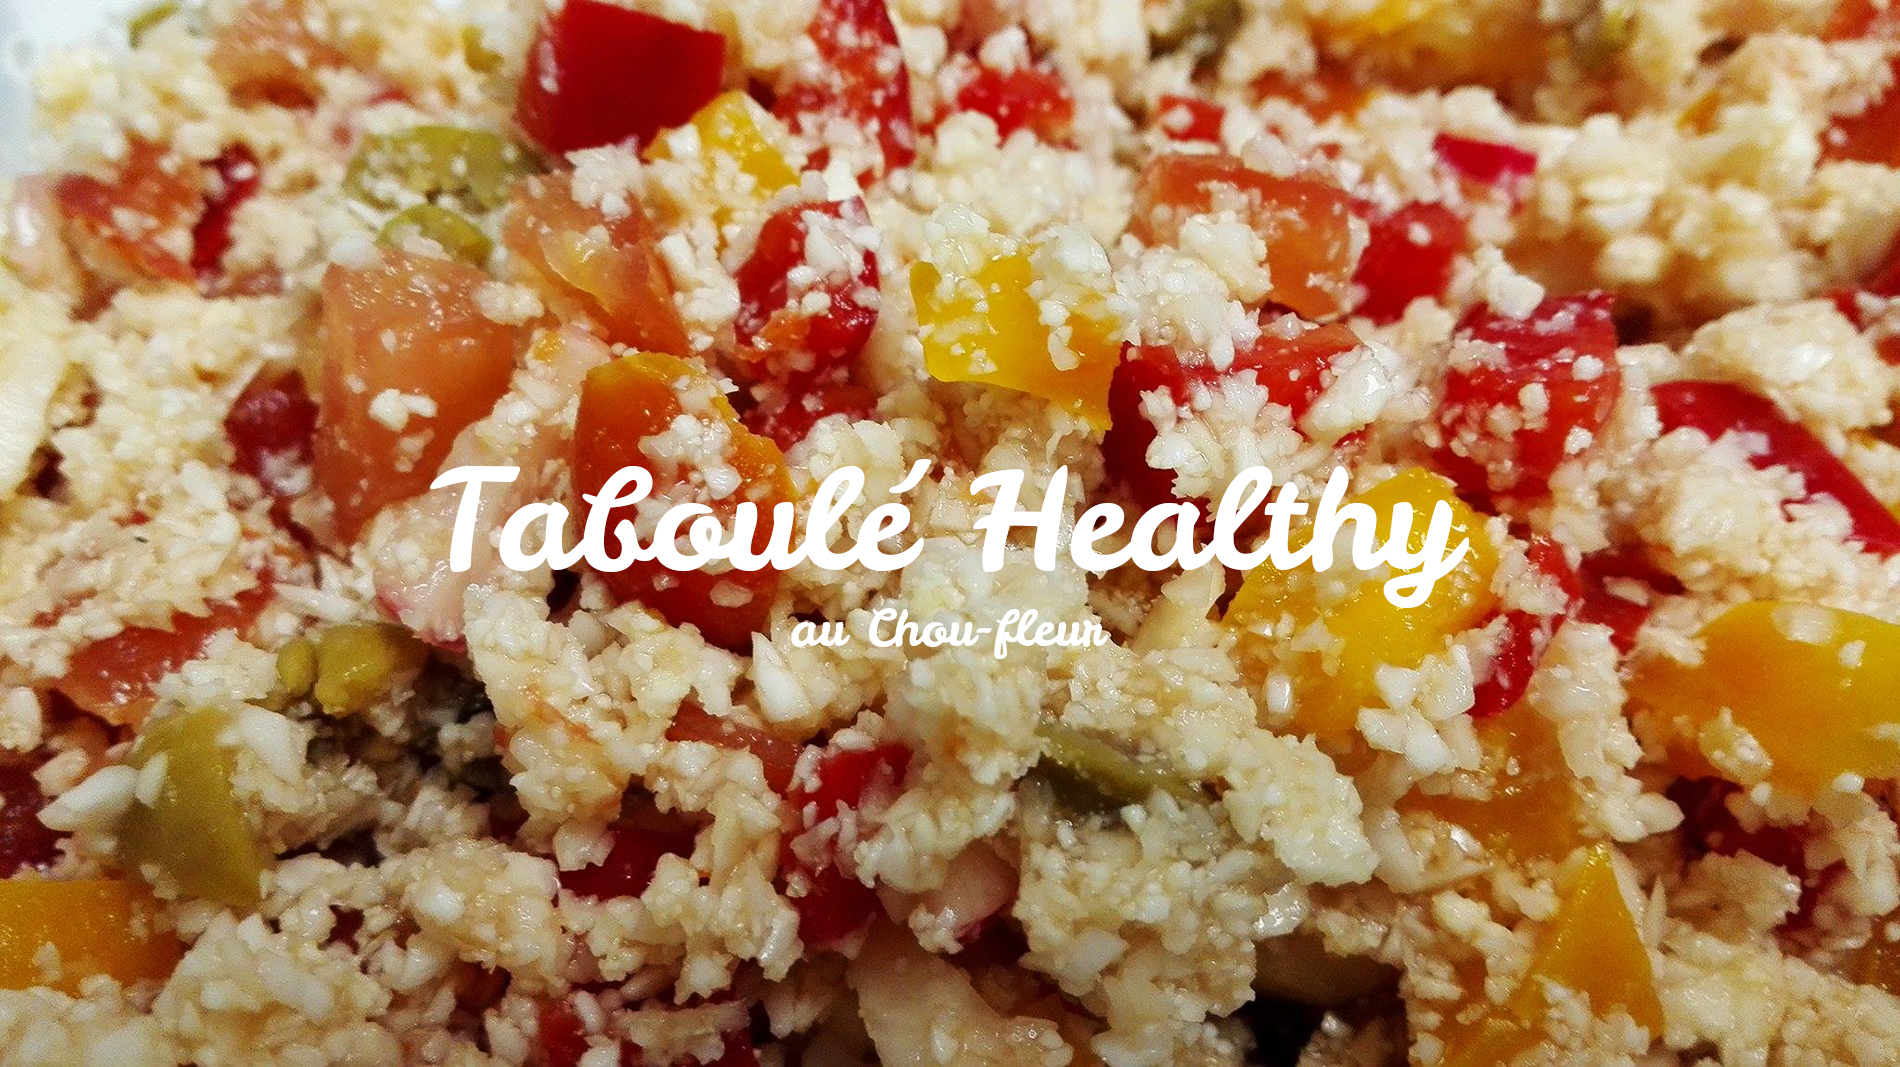 taboule-healthy-chou-fleur